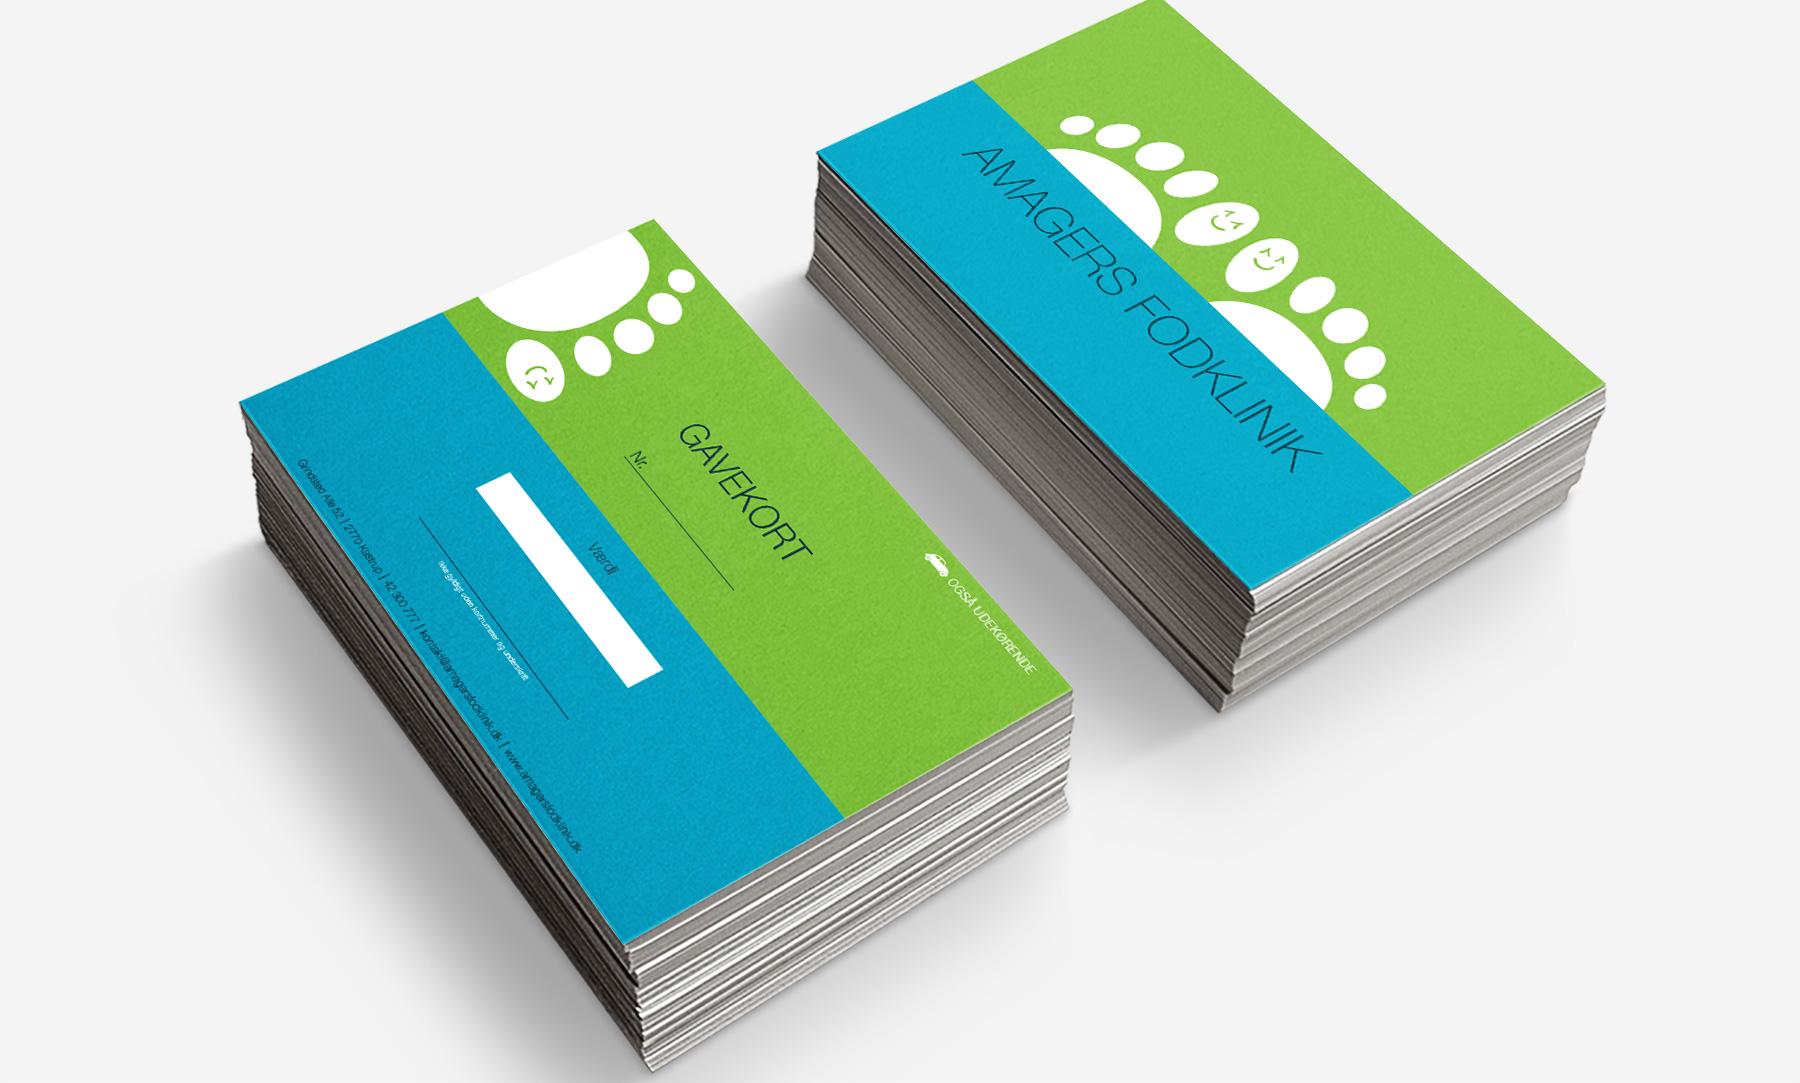 Amagers Fodklinik: Gift cards